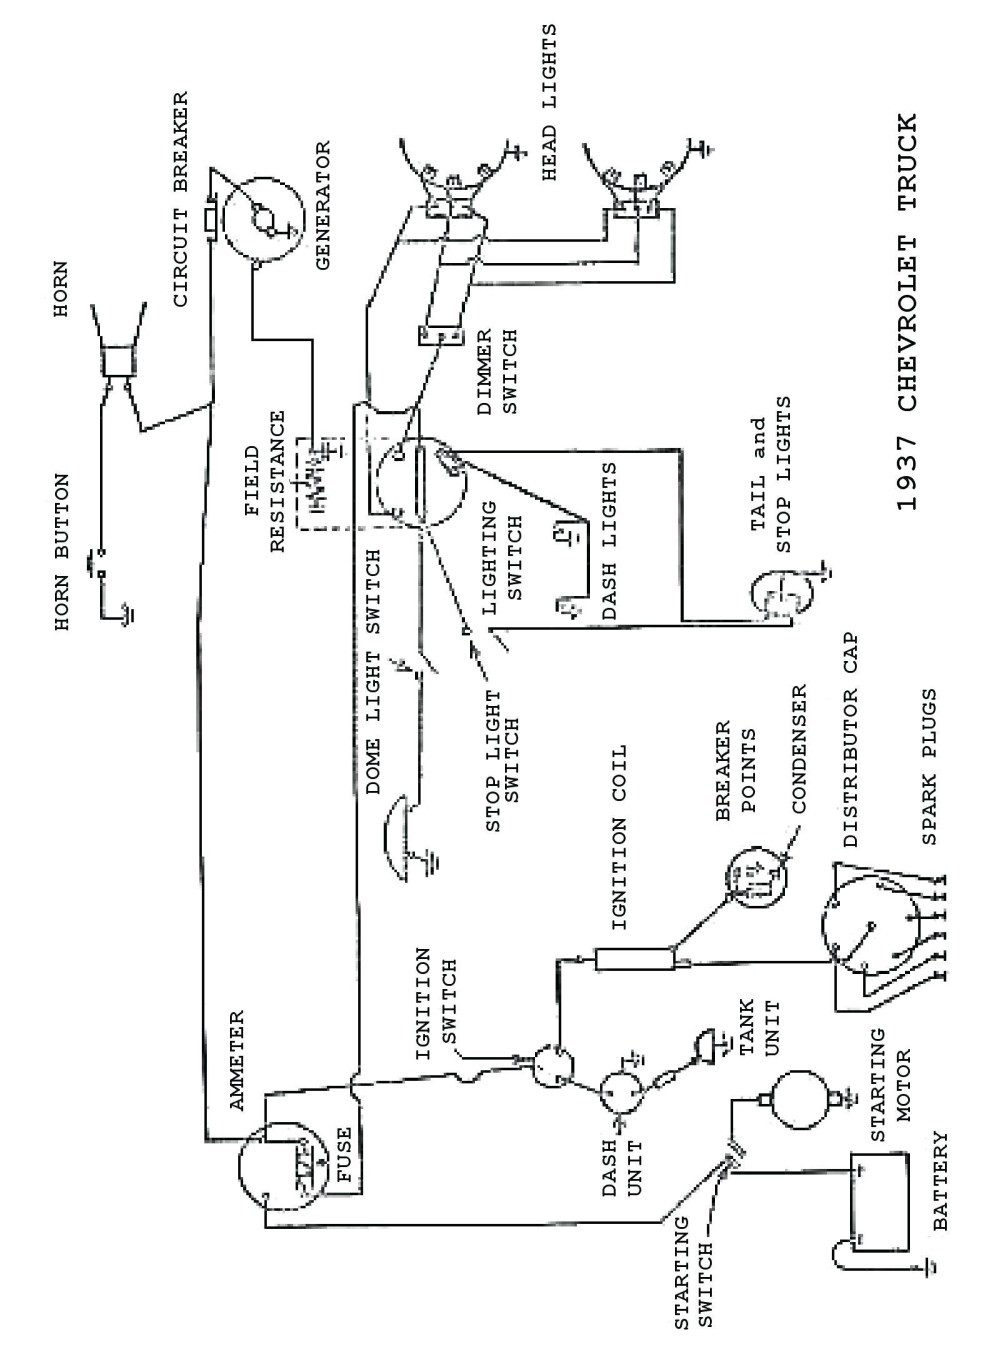 4020 John Deere Silinoid to Stater Wireing 12voalt Photos